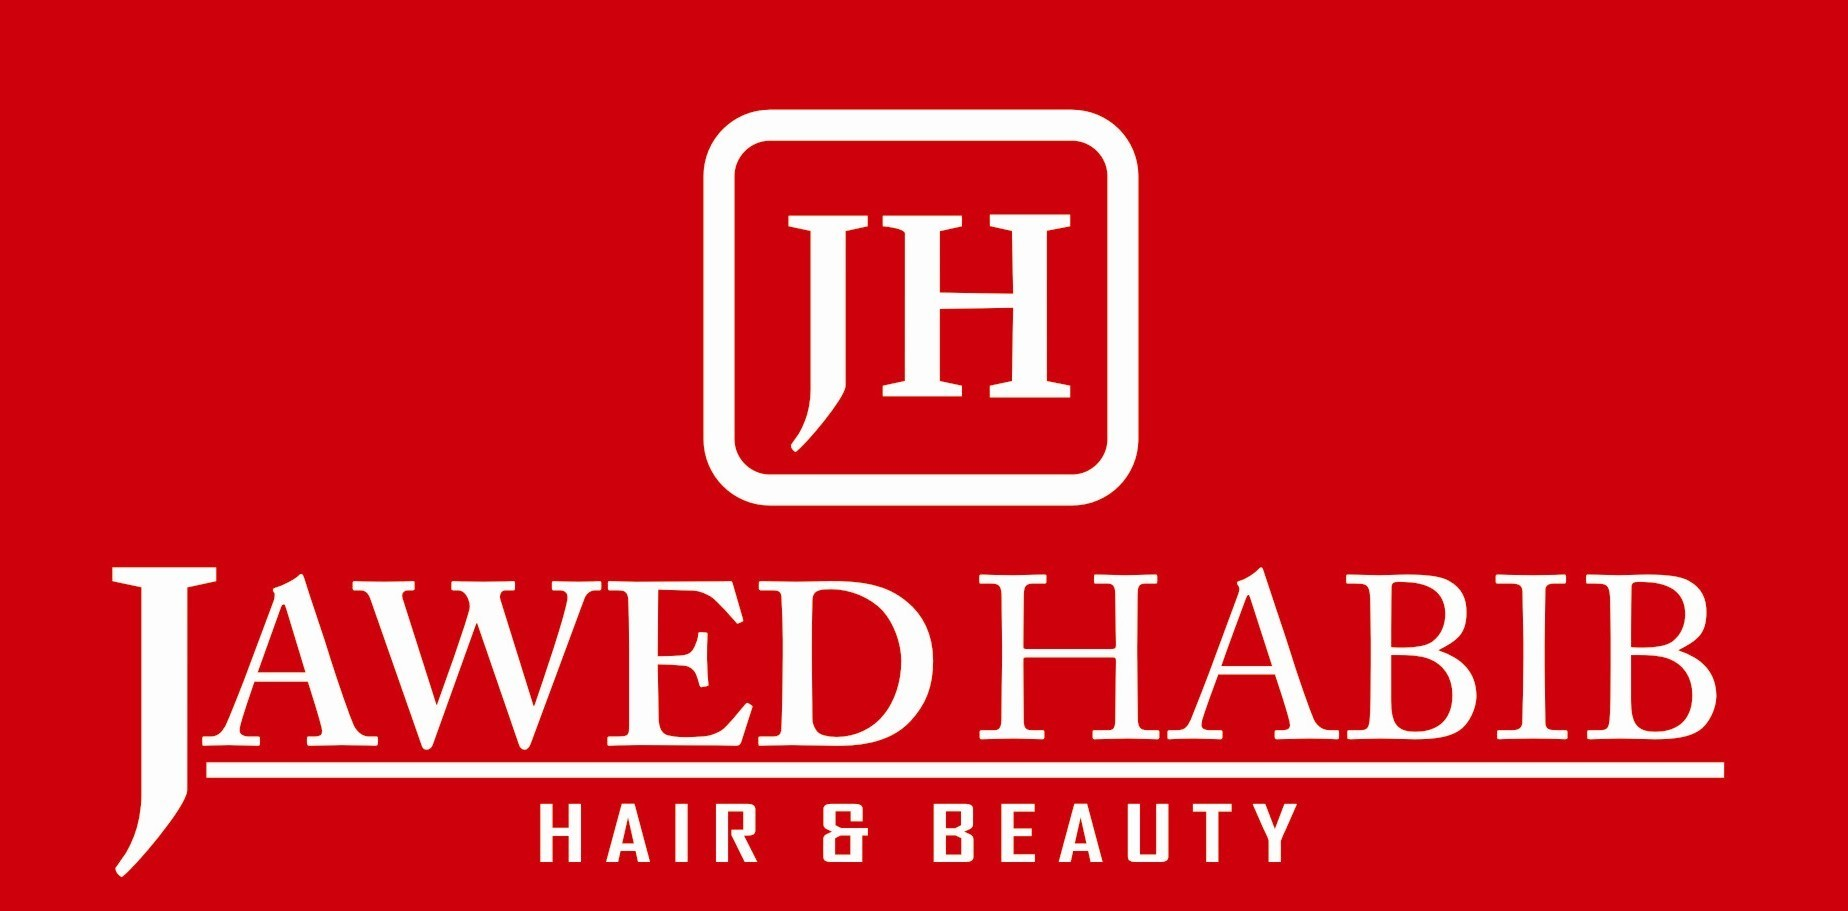 Jawed Habib Hair & Beauty Salons - Gandhi Chowk - Latur Image